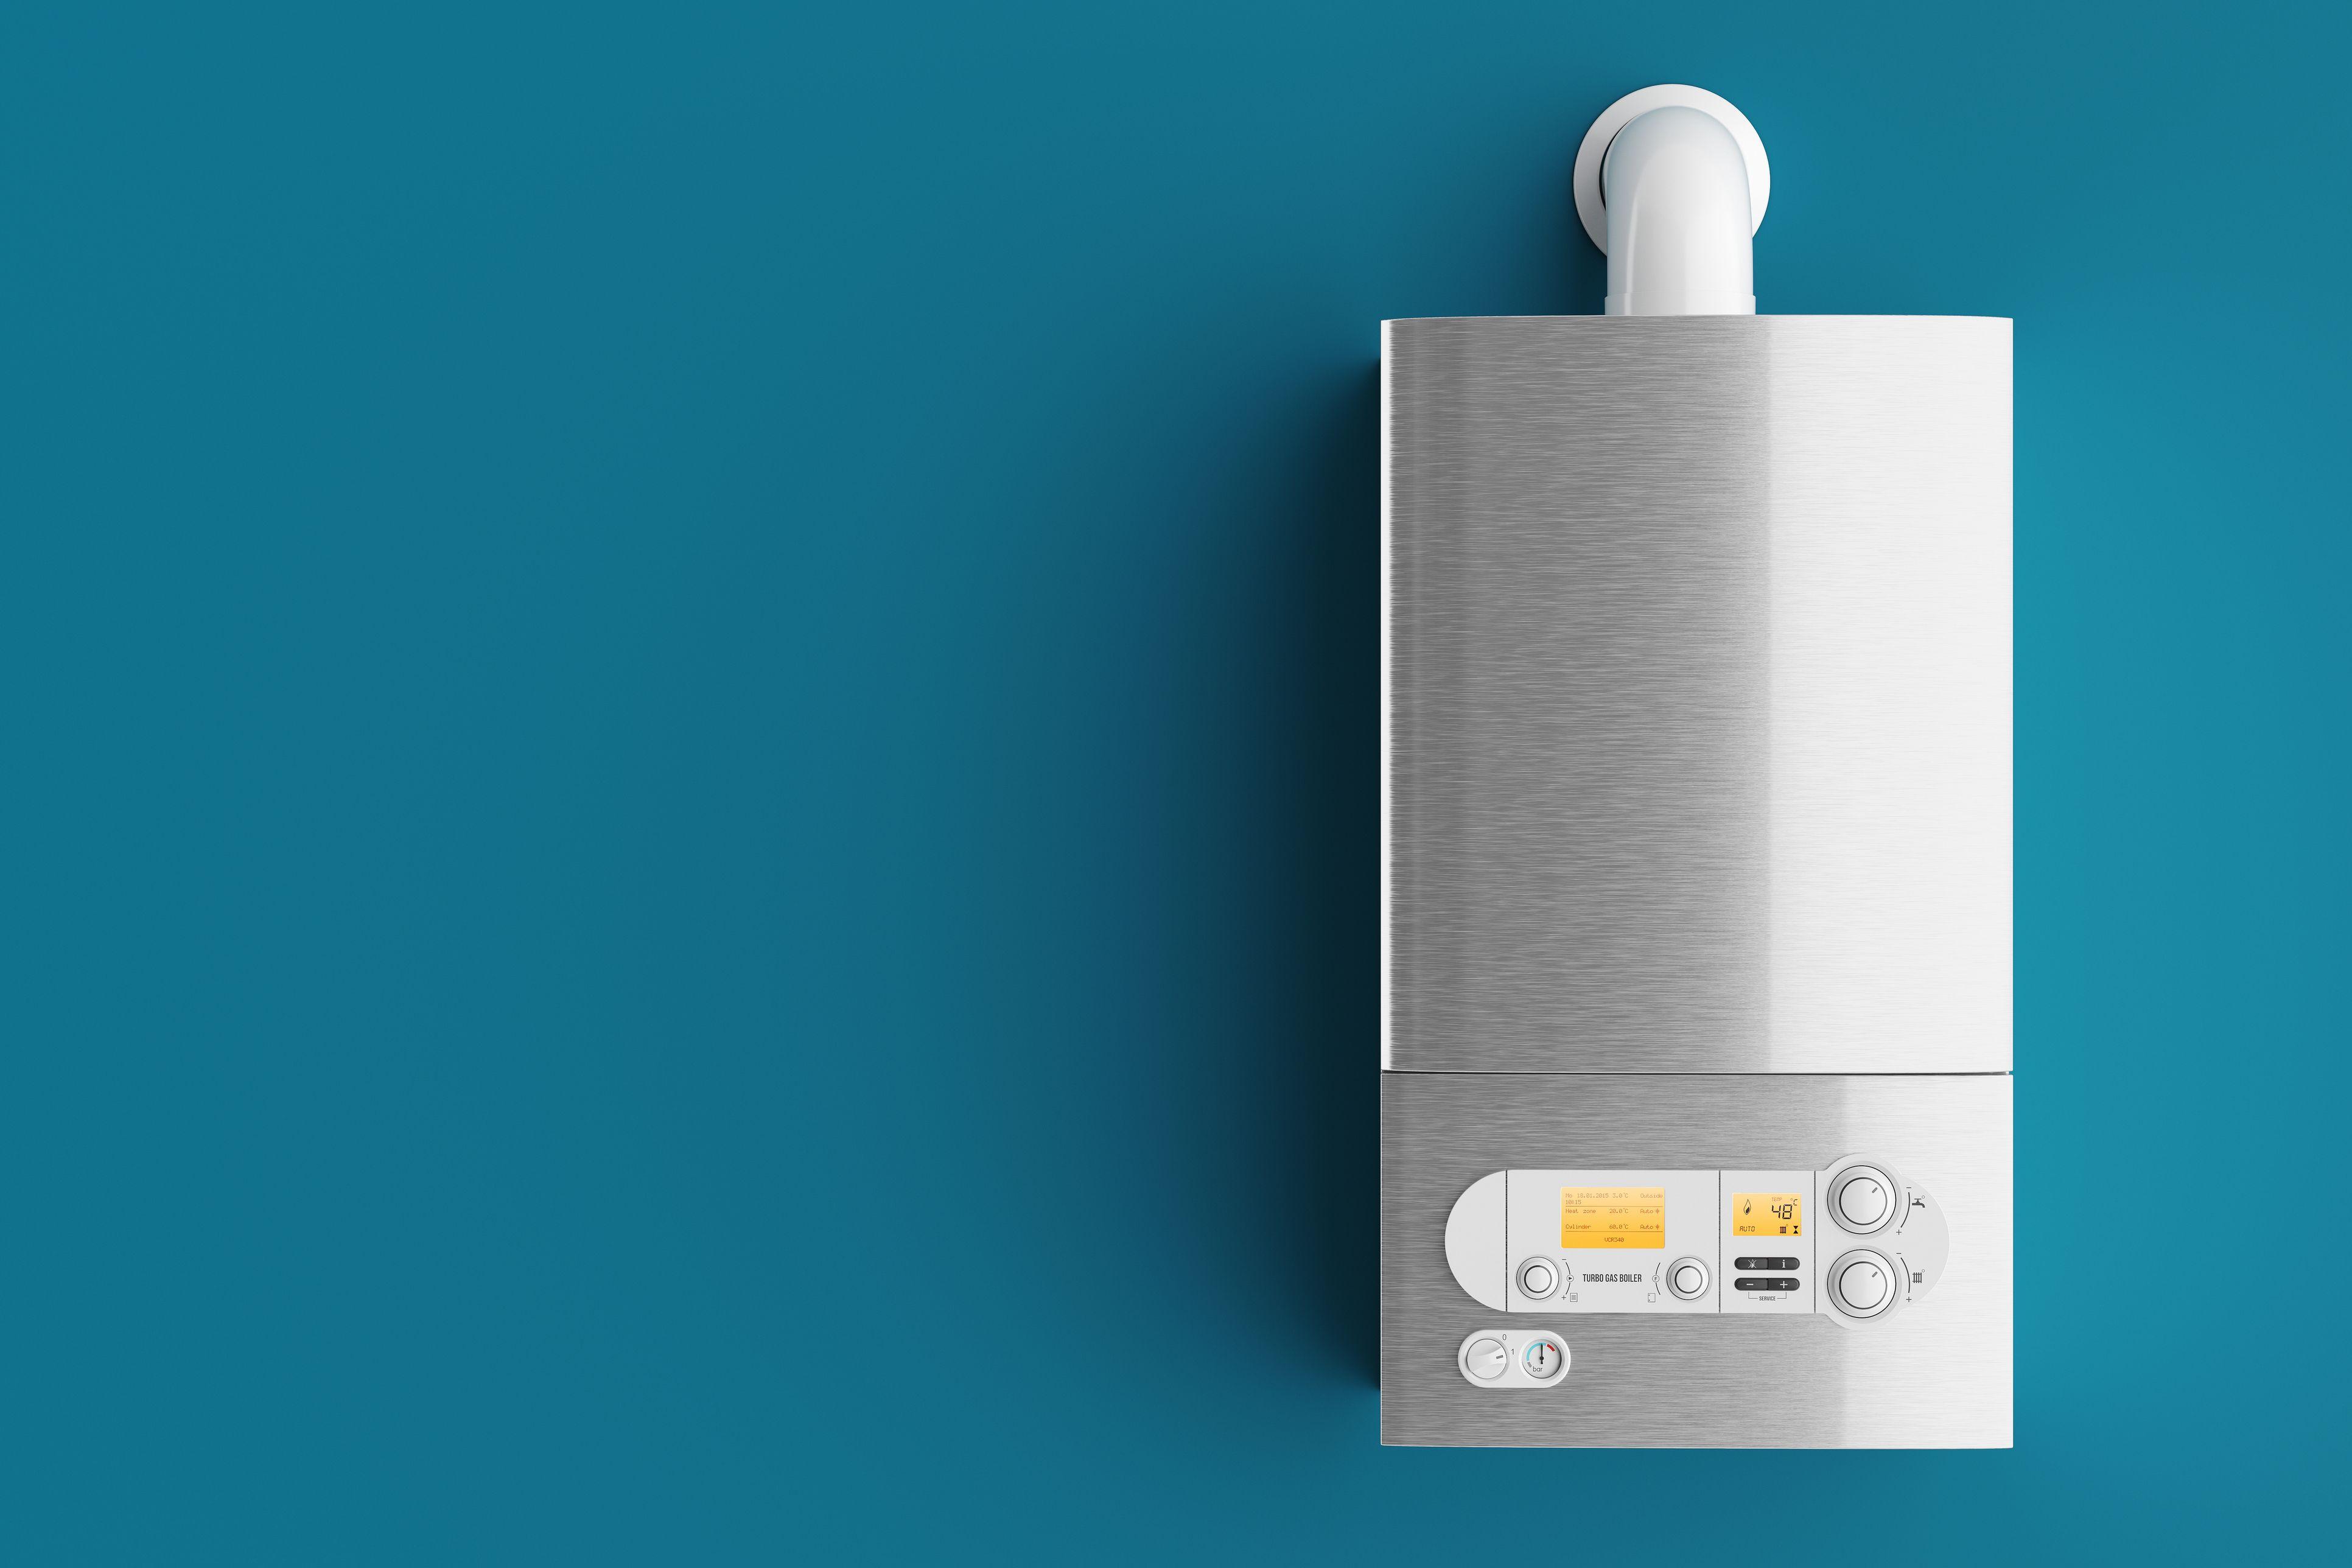 Household gas boiler on blue background 3d